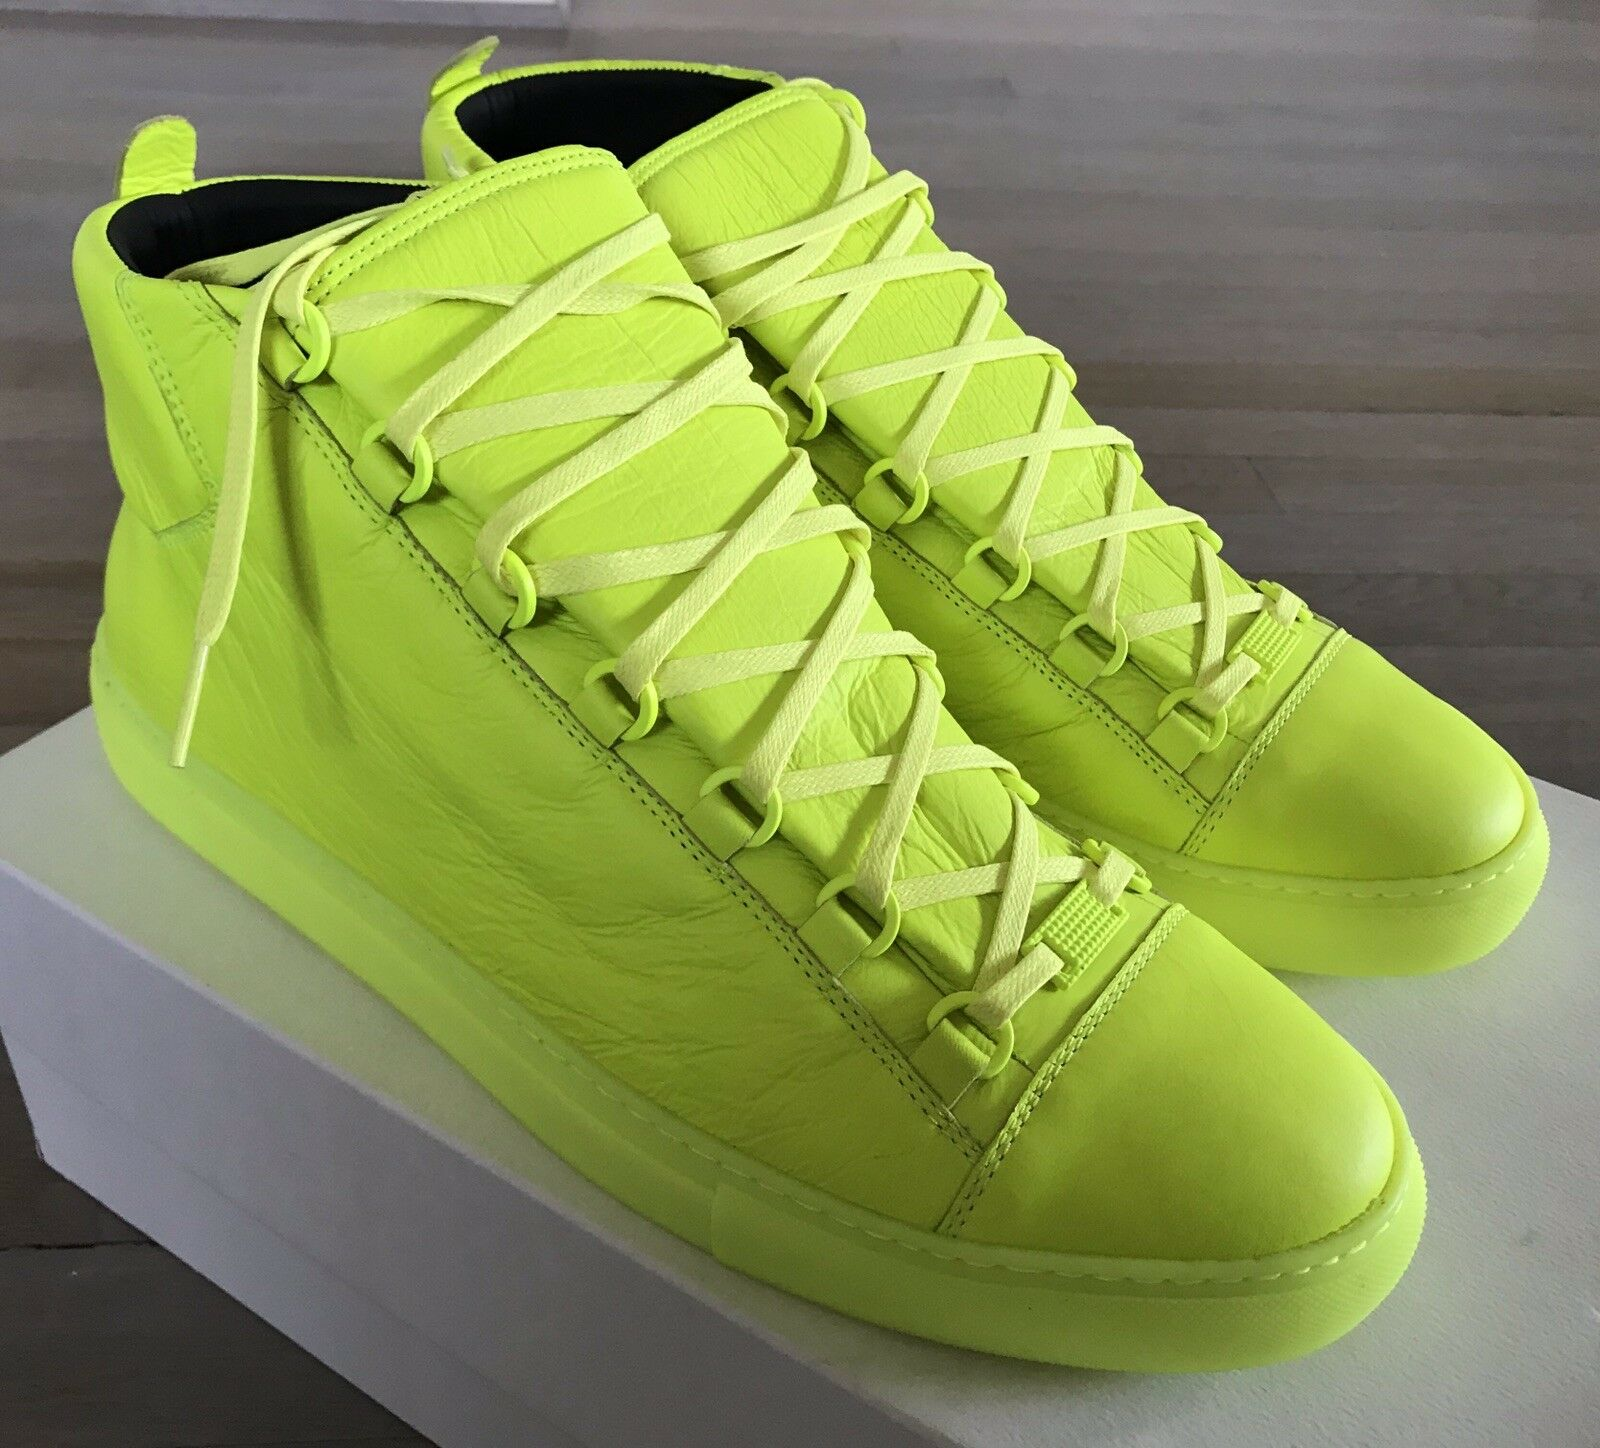 600  Balenciaga Arena Fluorescence Leather High Tops Sneakers size US 14, EU 47